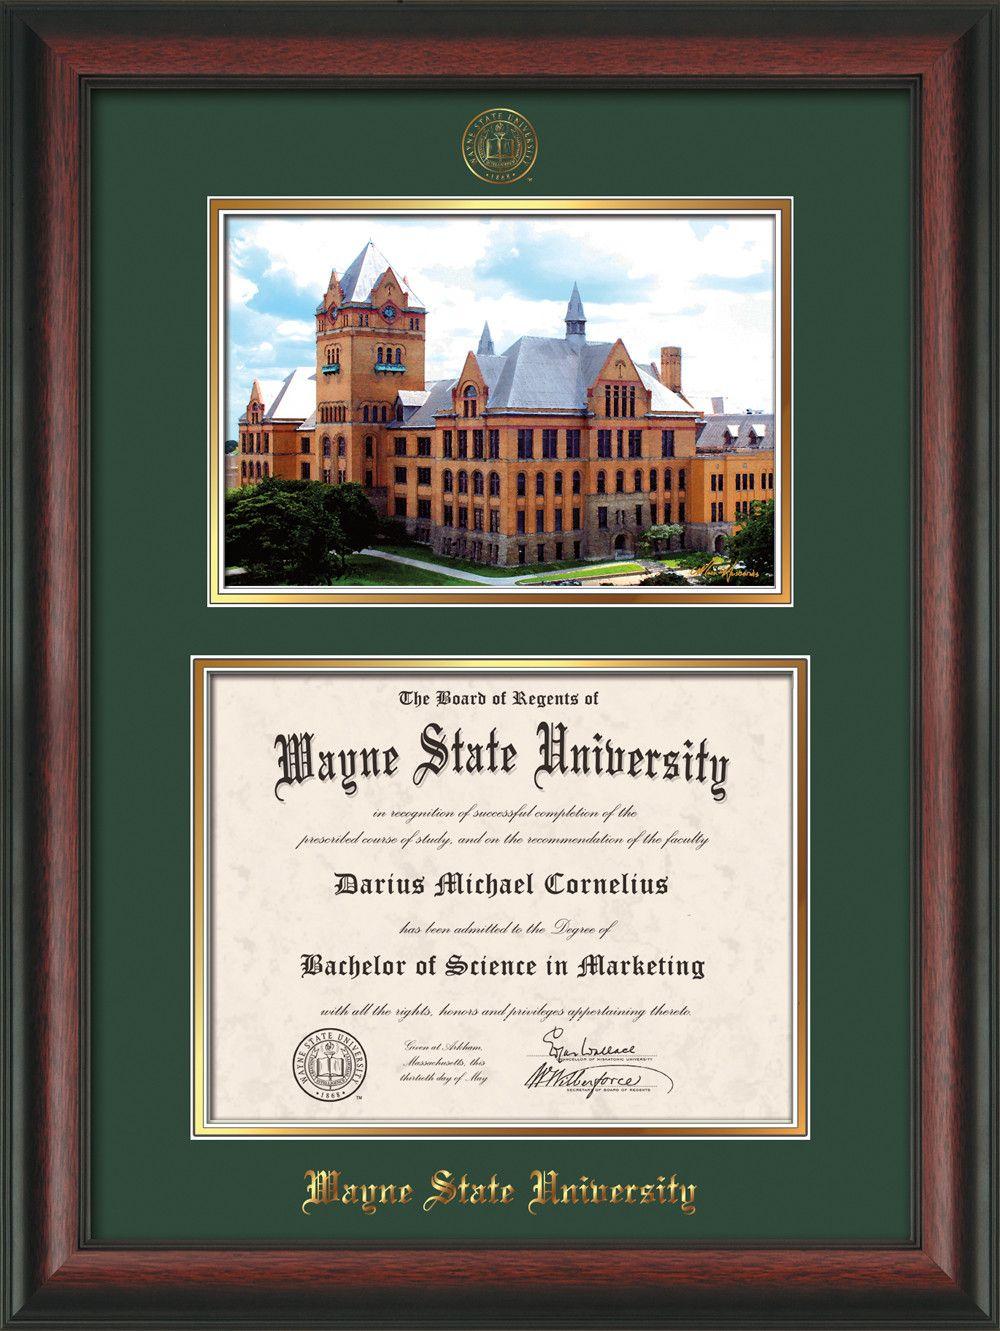 Wayne State University Diploma Frame Rosewood W Embossed Wsu Seal Name Watercolor Green On Go Wayne State University Diploma Frame University Diploma